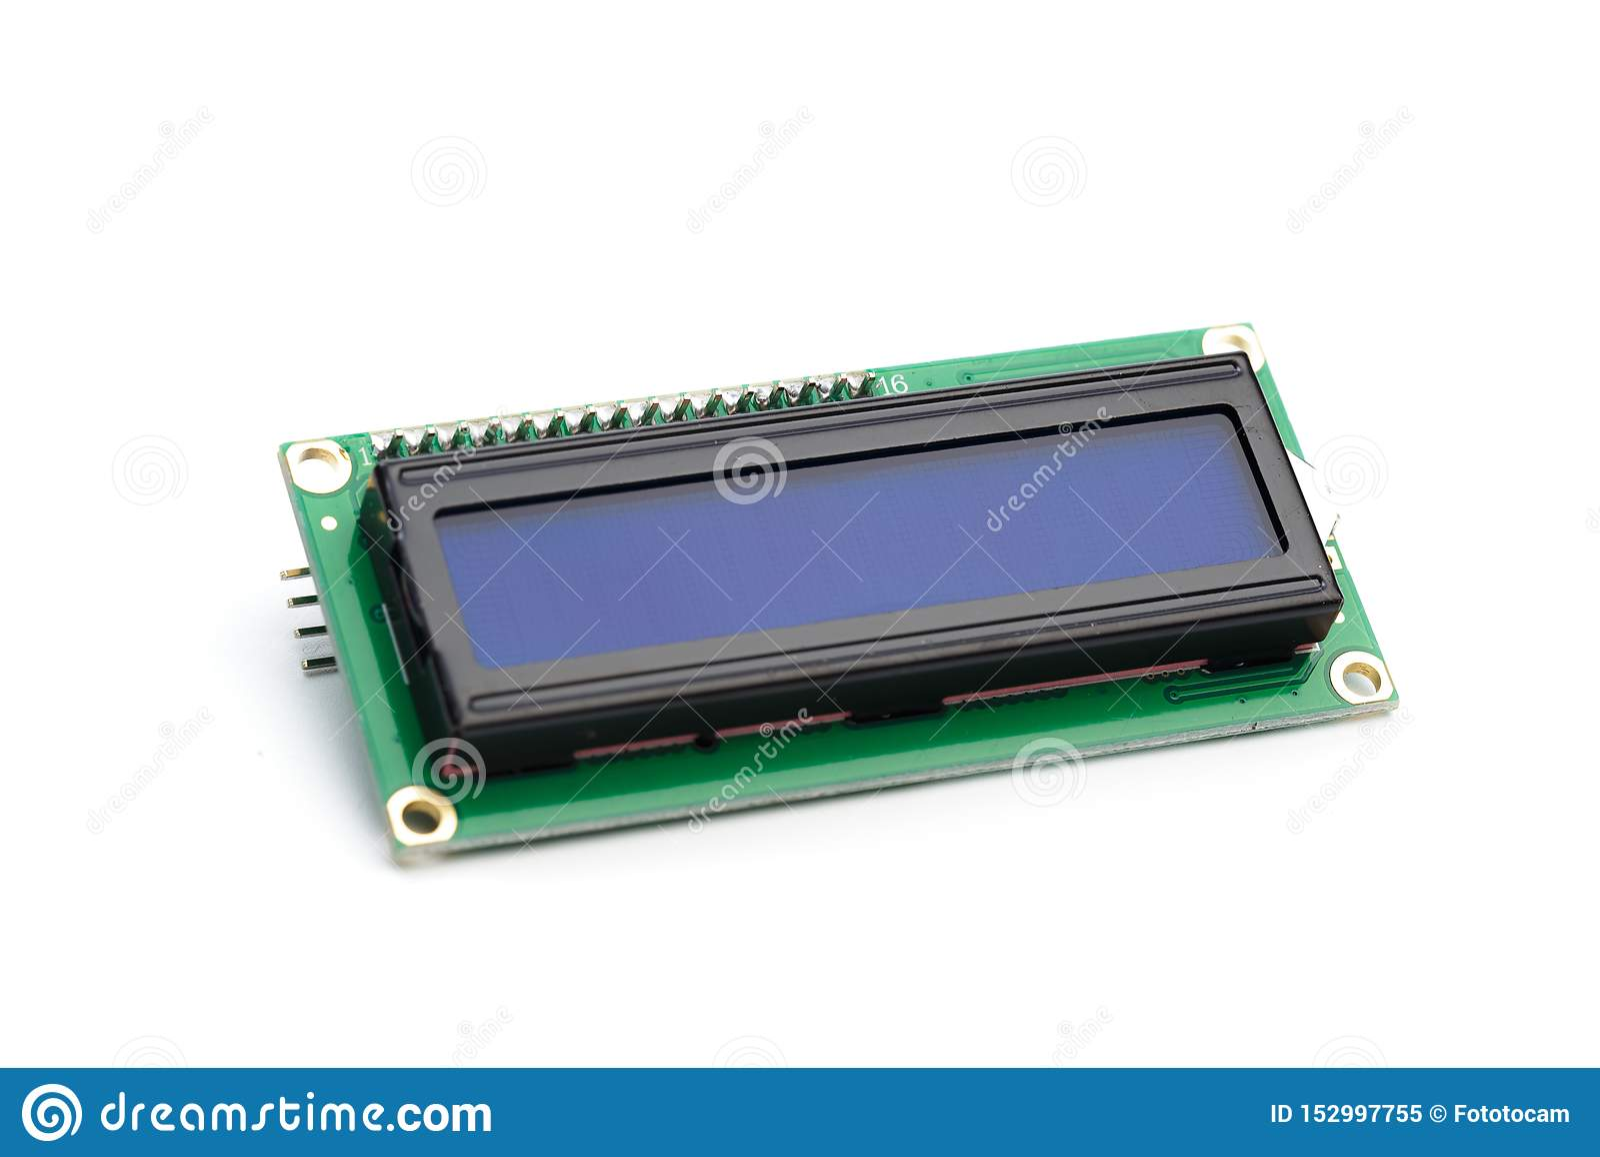 LCD indicator isolated on white background